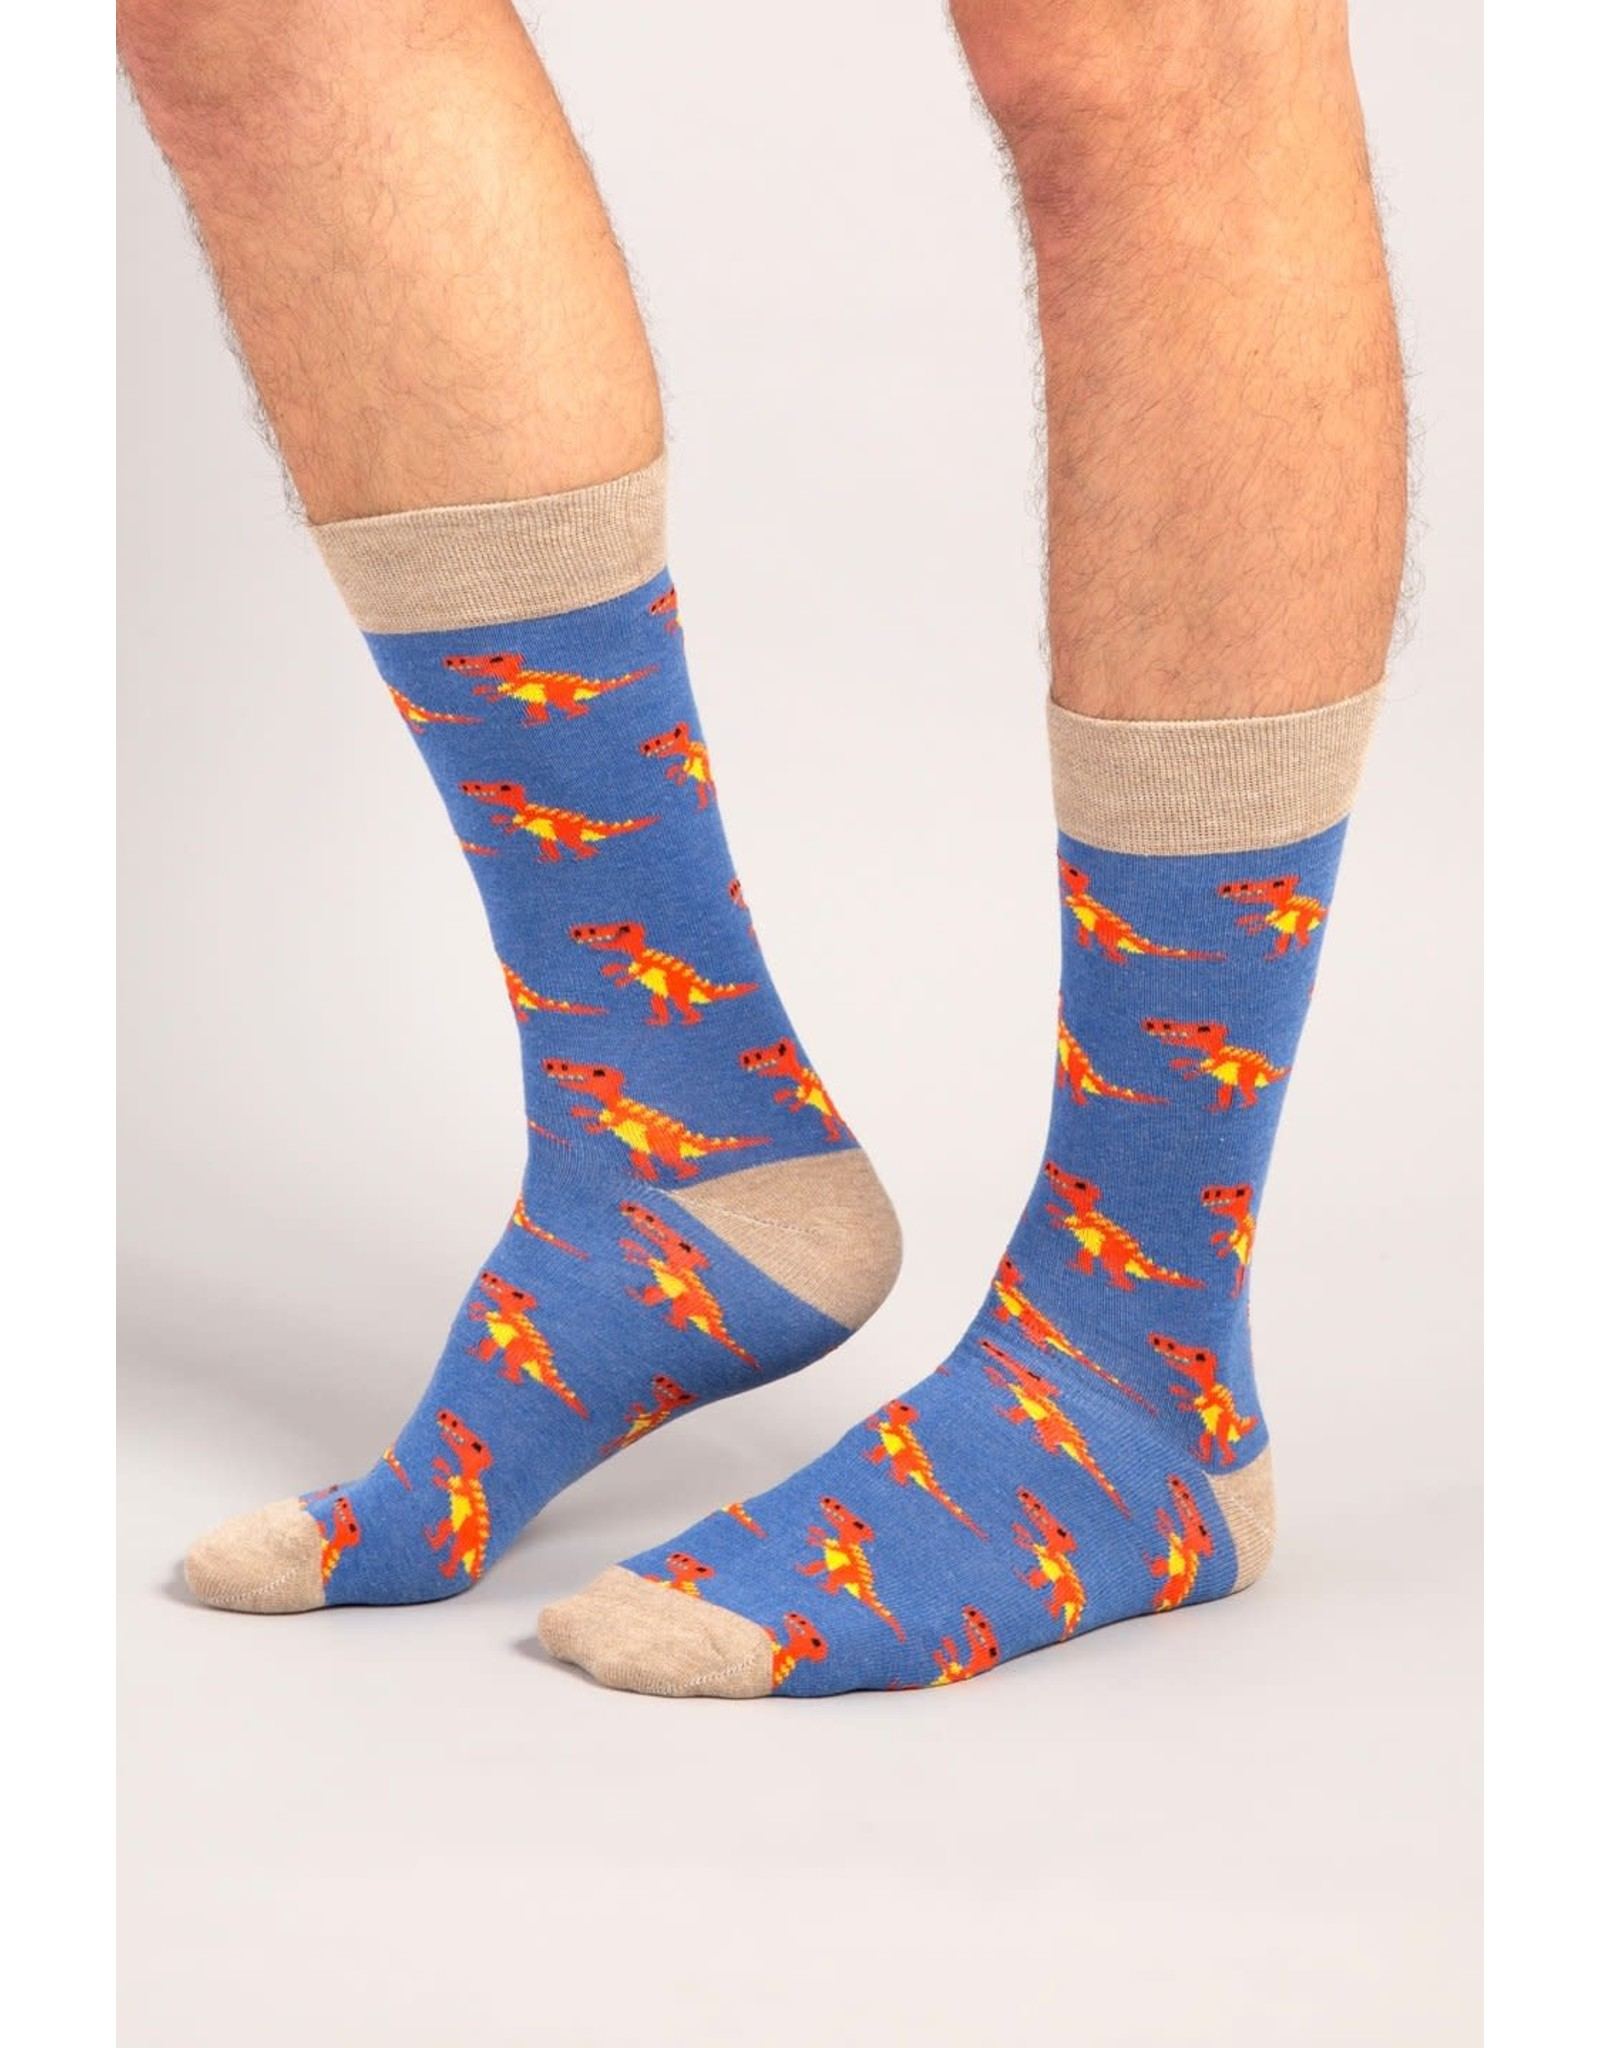 Moustard socks - T-rex (41-46)